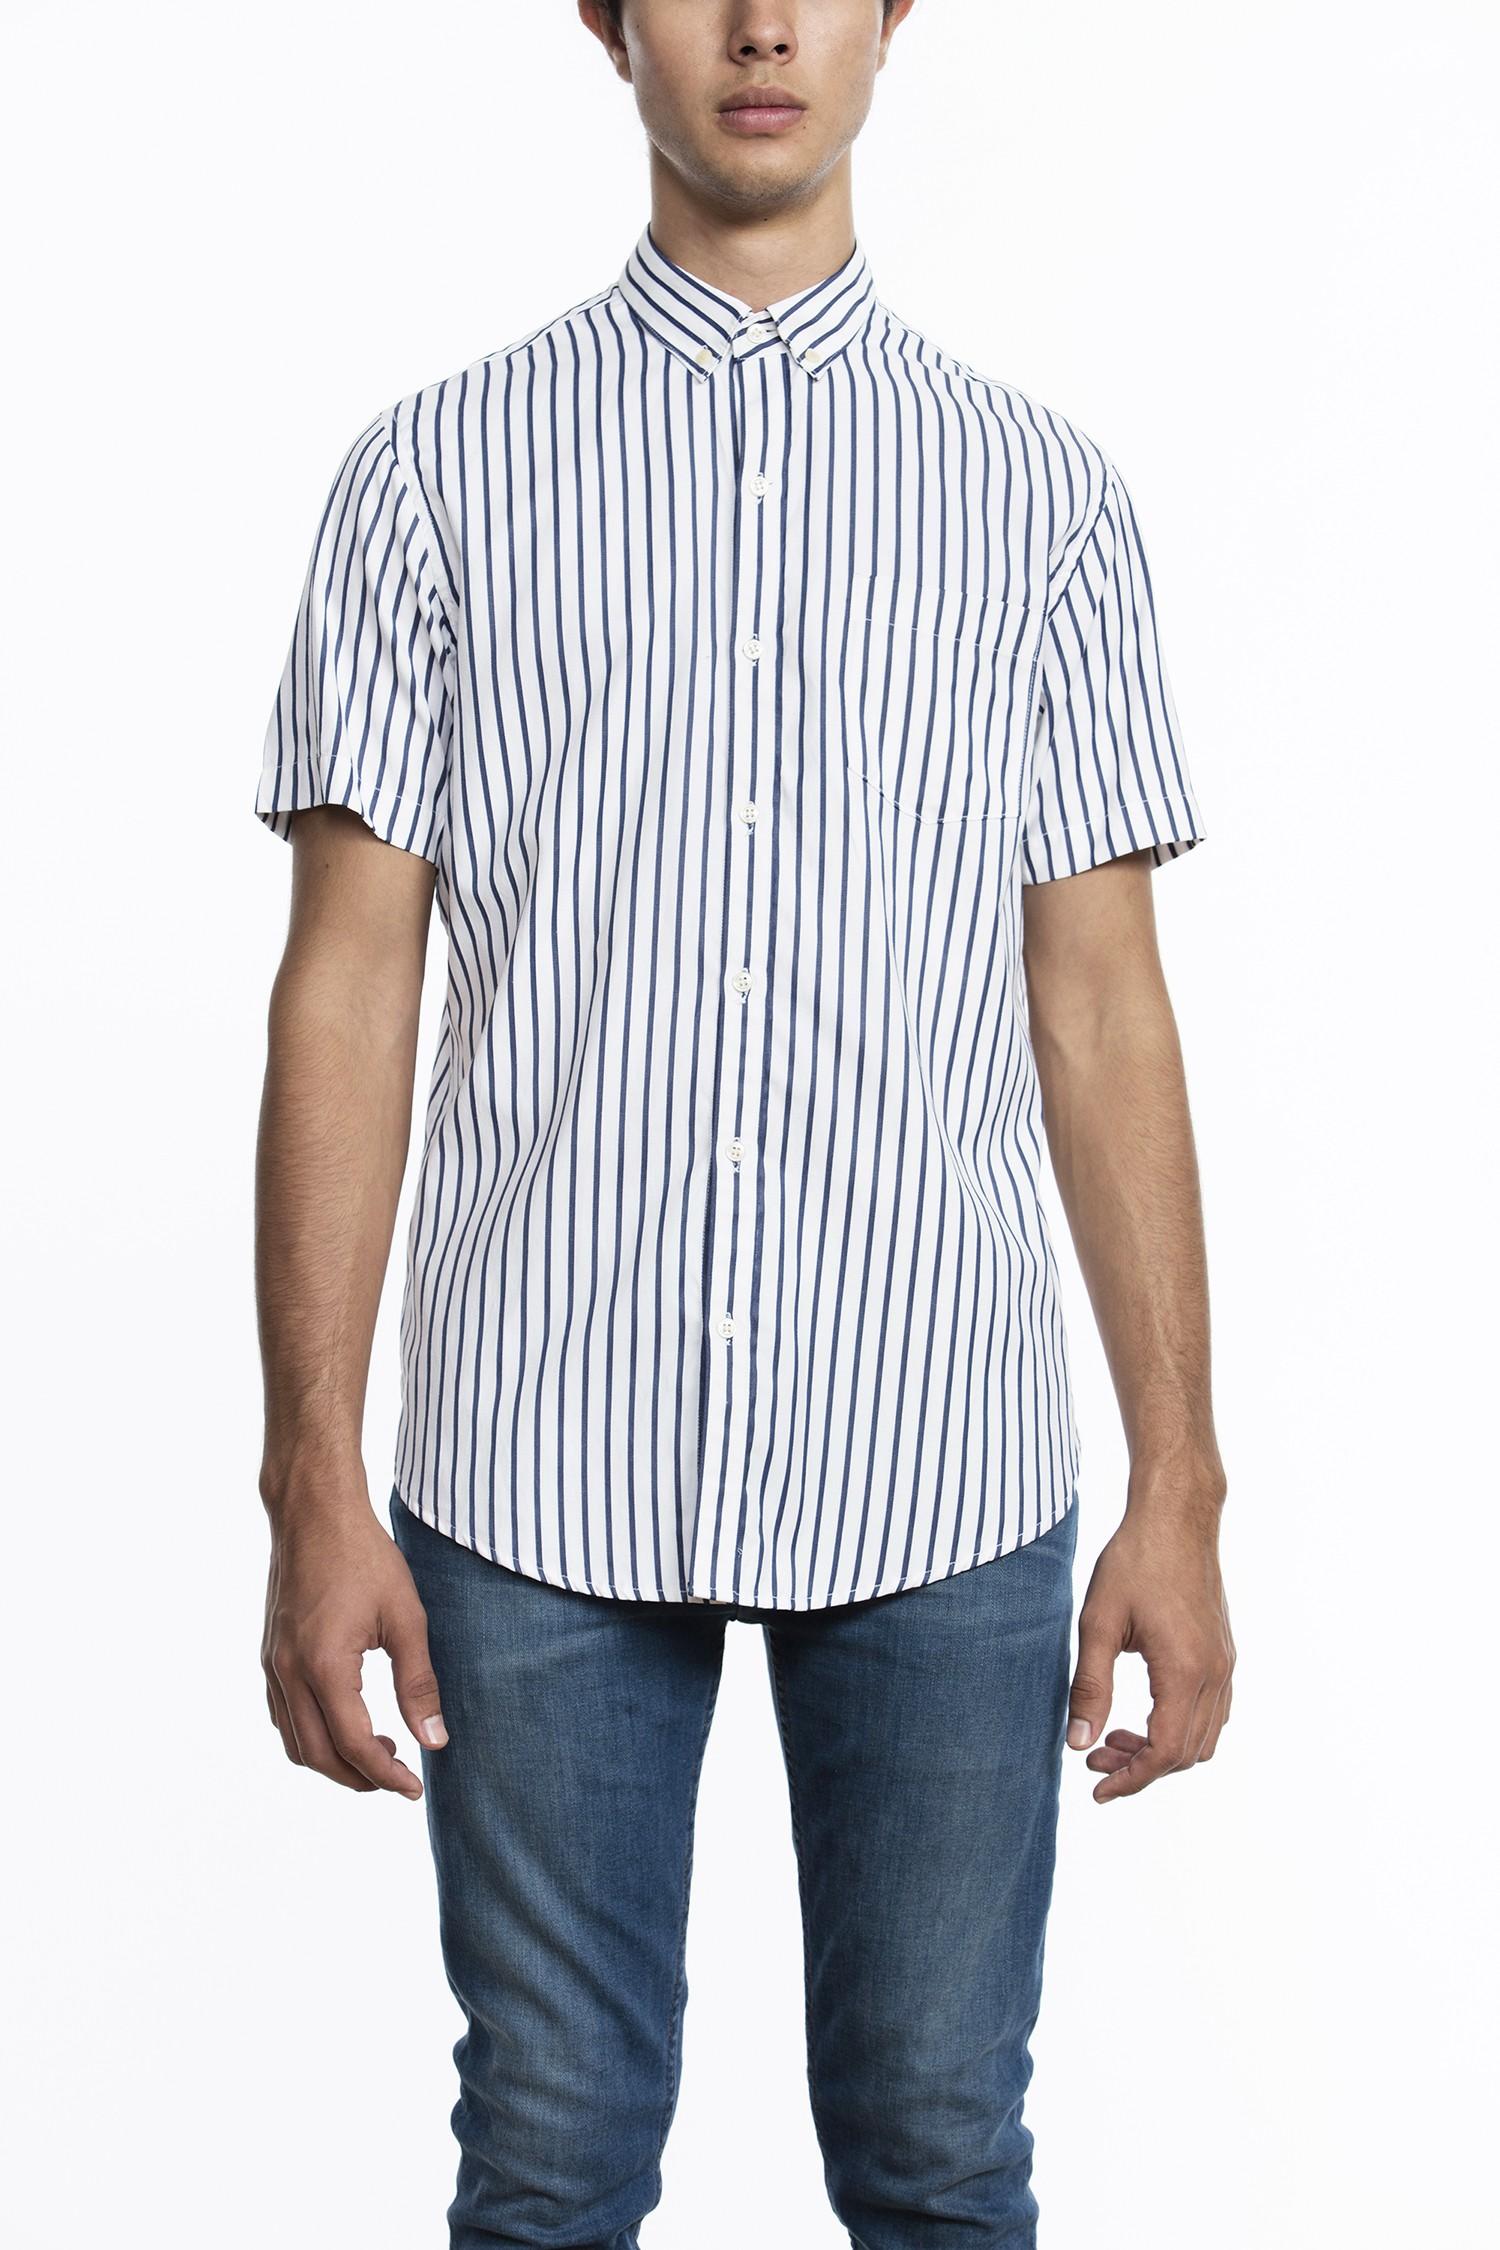 https://distefanoshop.com/es/shop/hombre/tops/push-your-boundaries-shirt-blanco